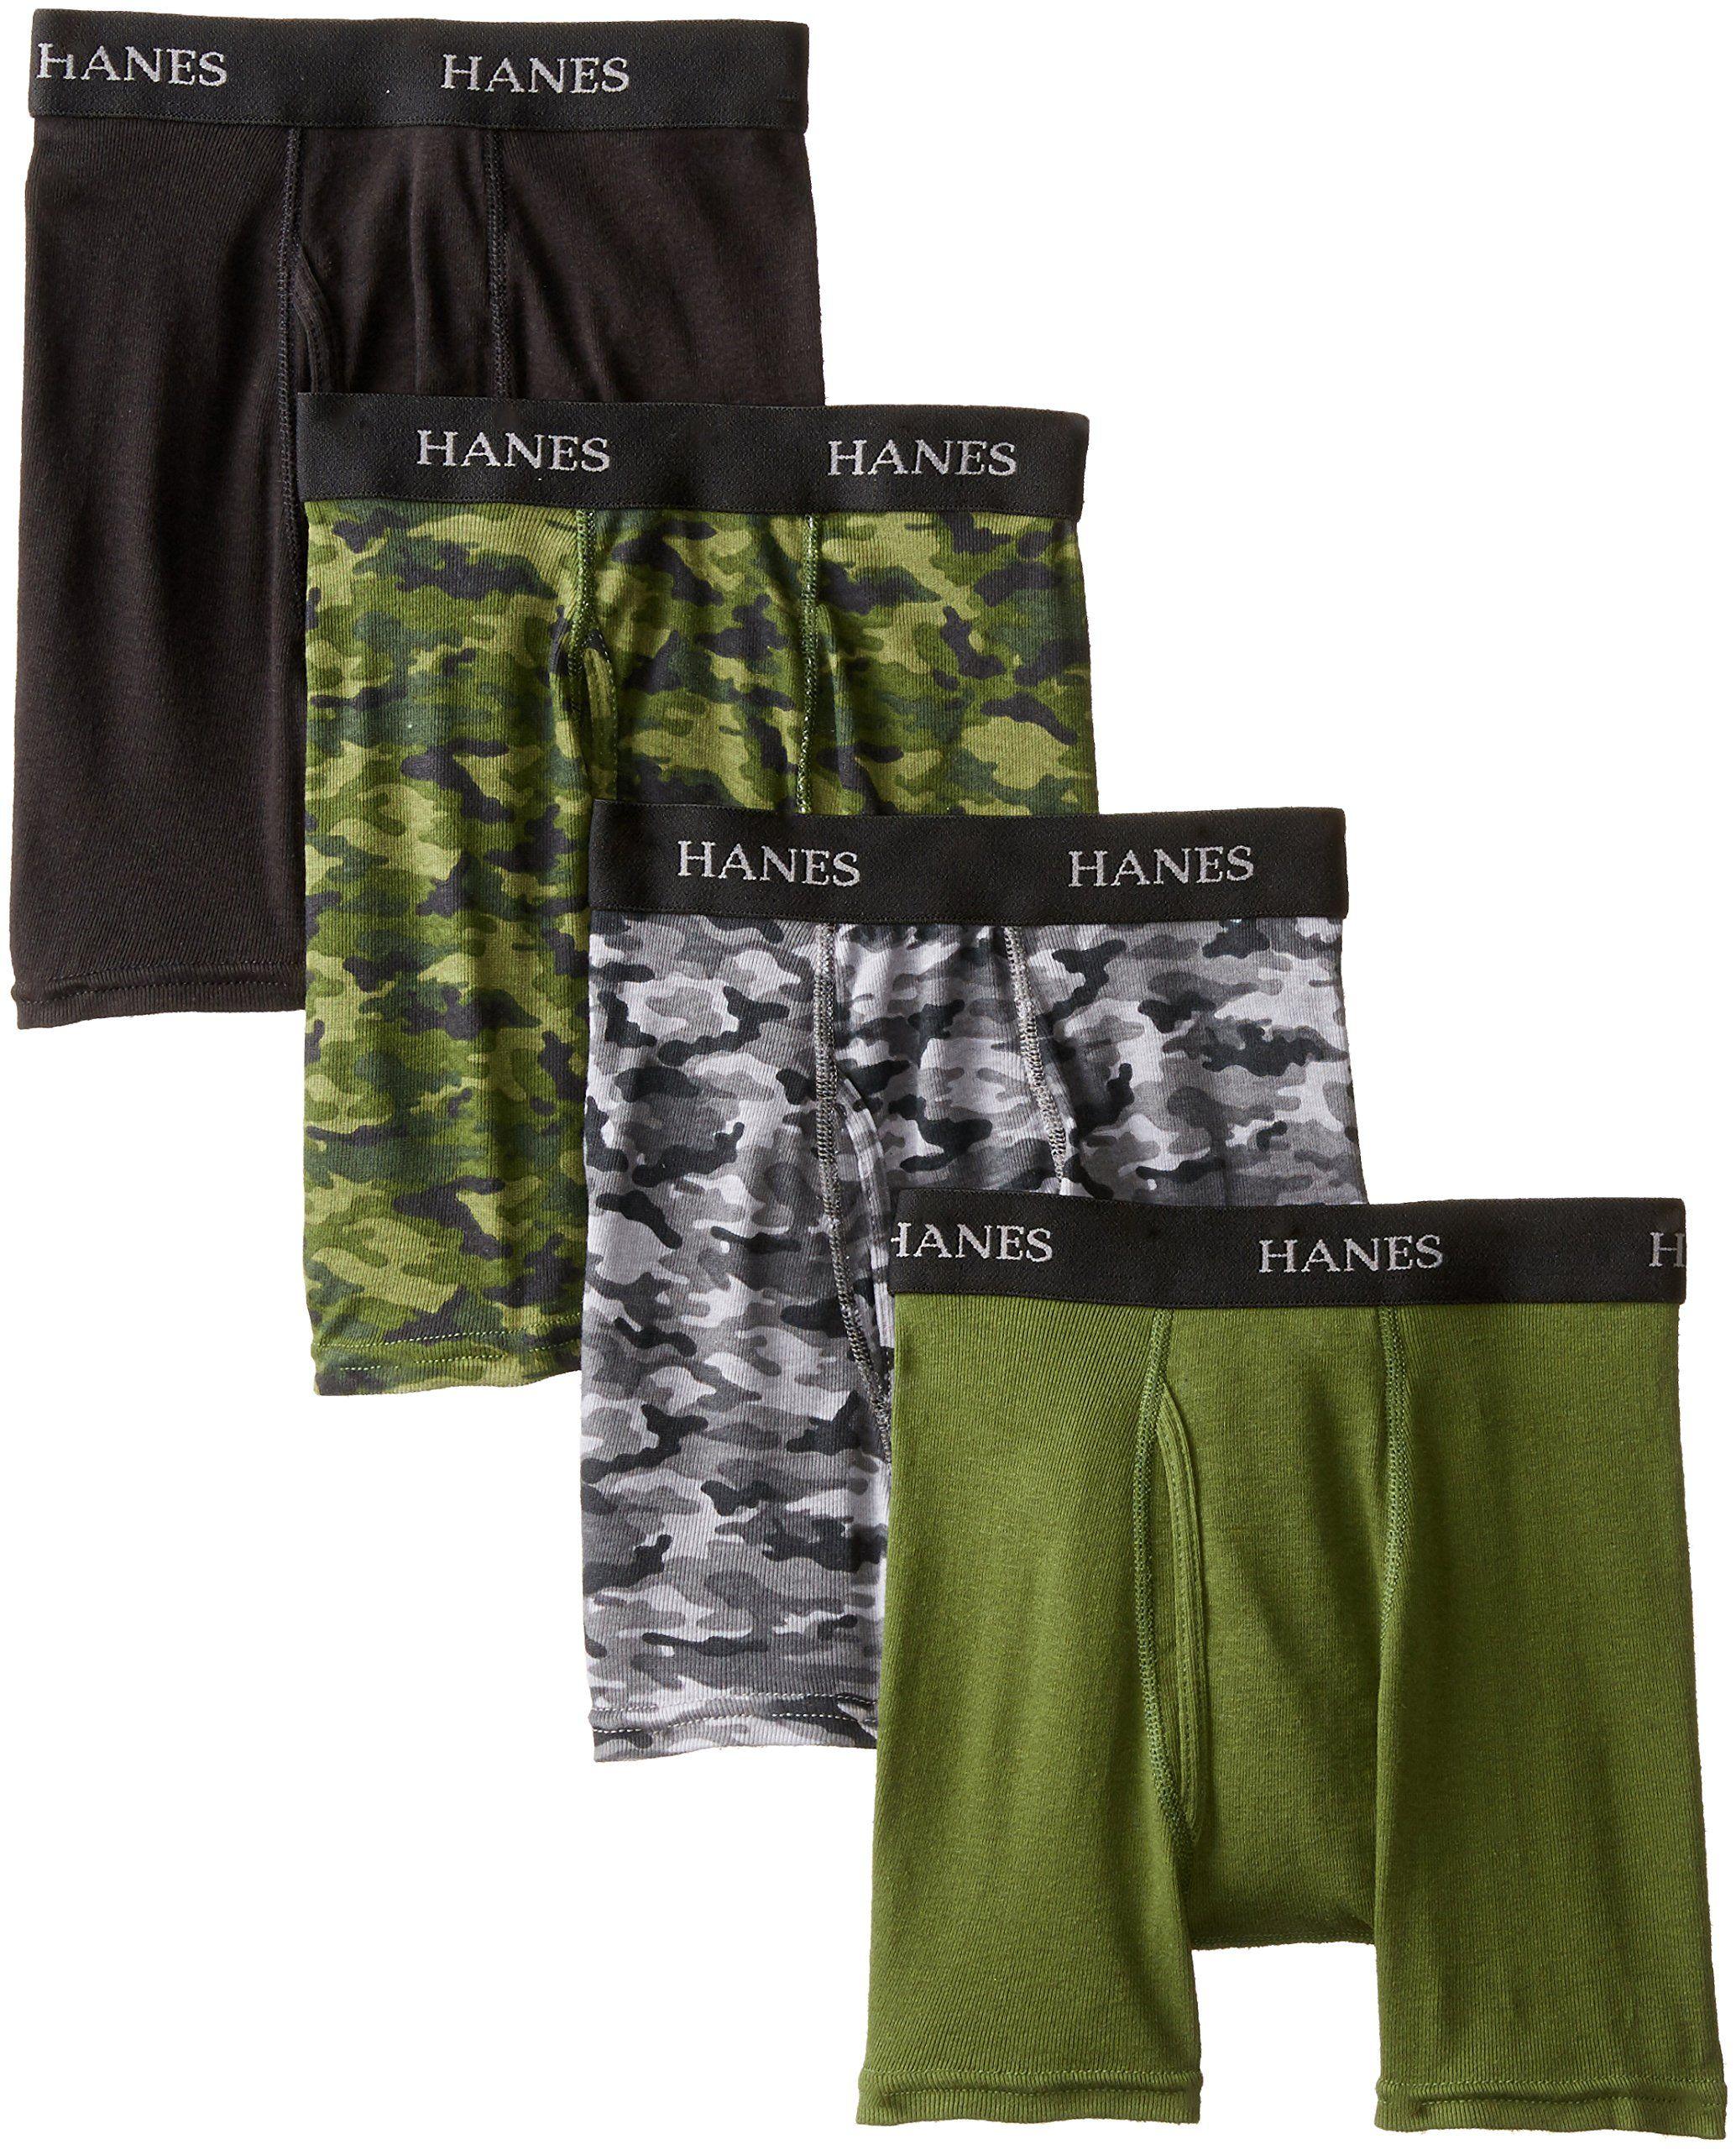 Hanes boys 4 pack ultimate comfort flex printed boxer